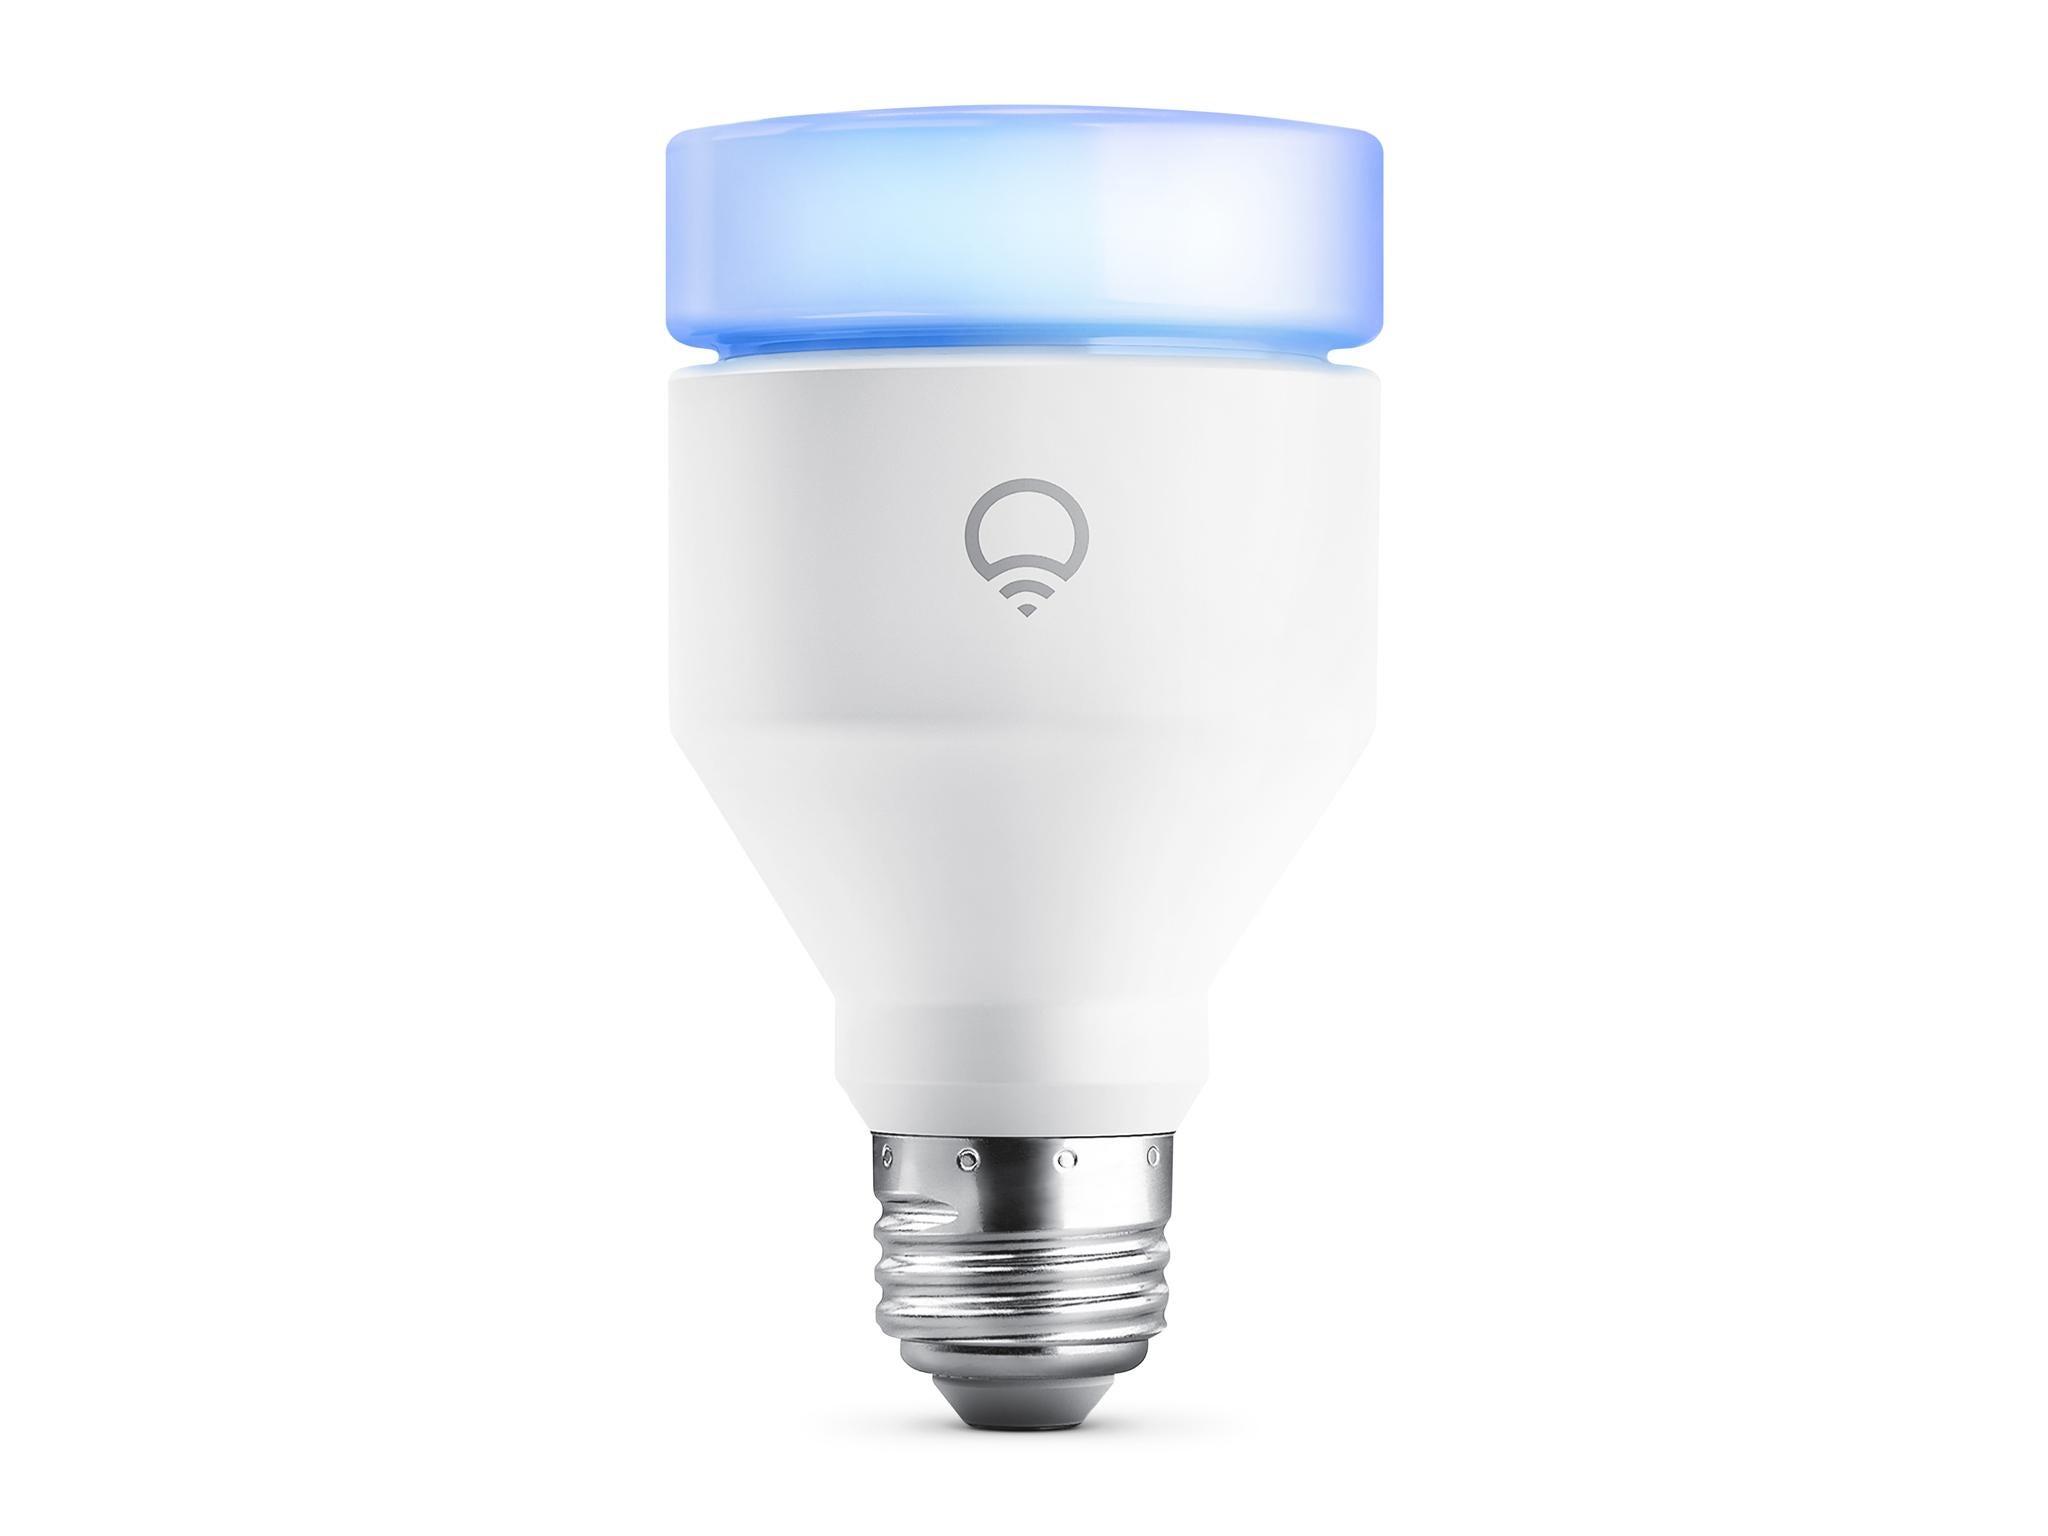 10 best smart lighting | The Independent